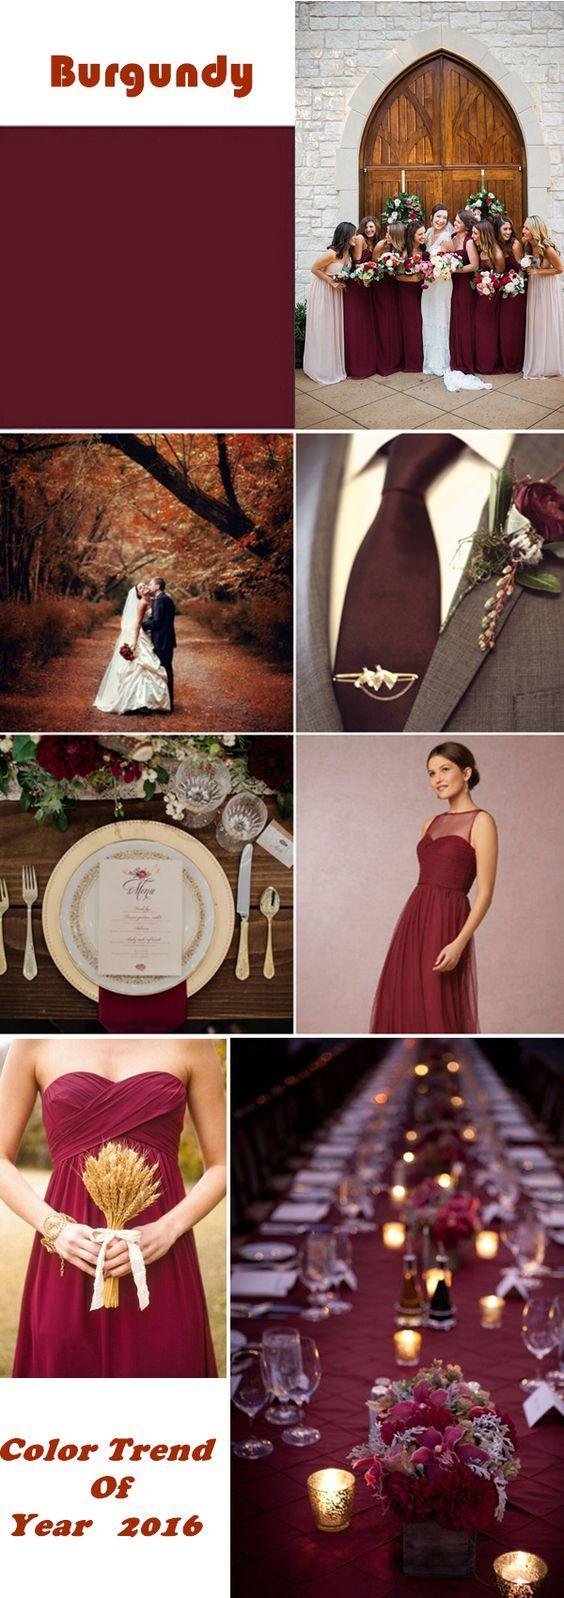 best weddings images on pinterest turquoise wedding rings